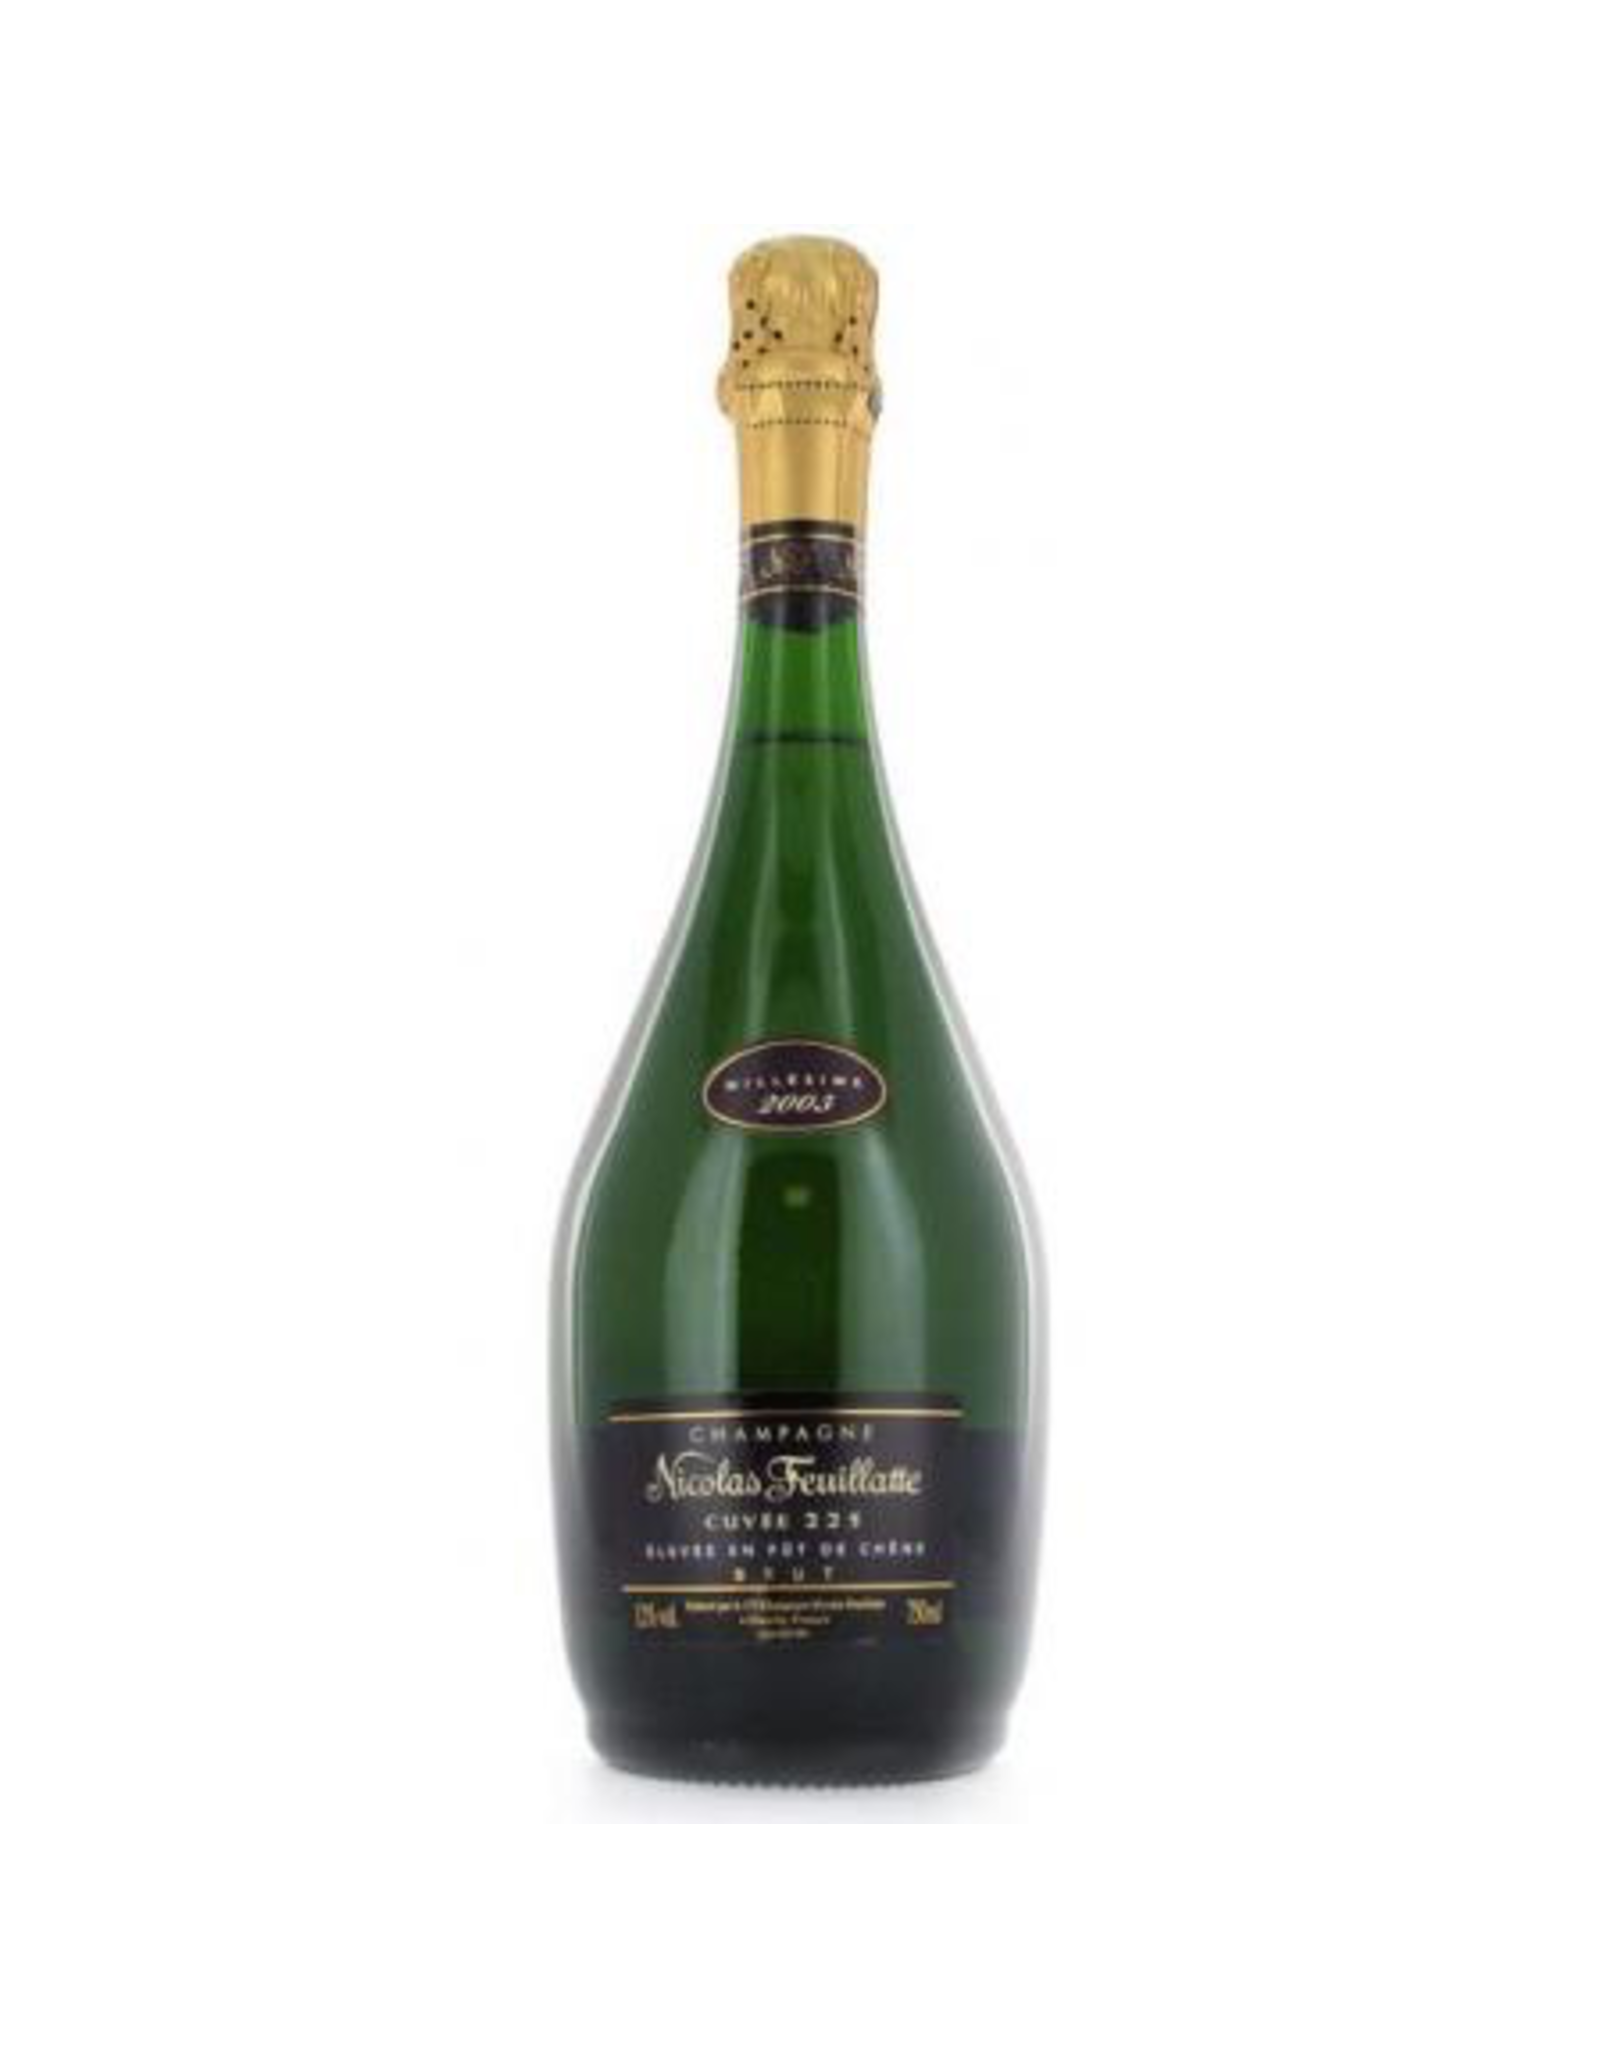 Sparkling Wine 2003, Nicholas Feuillatte Cuvee 225 Millesime Brut, Chouilly, Champagne, France, 12% Alc, TW96